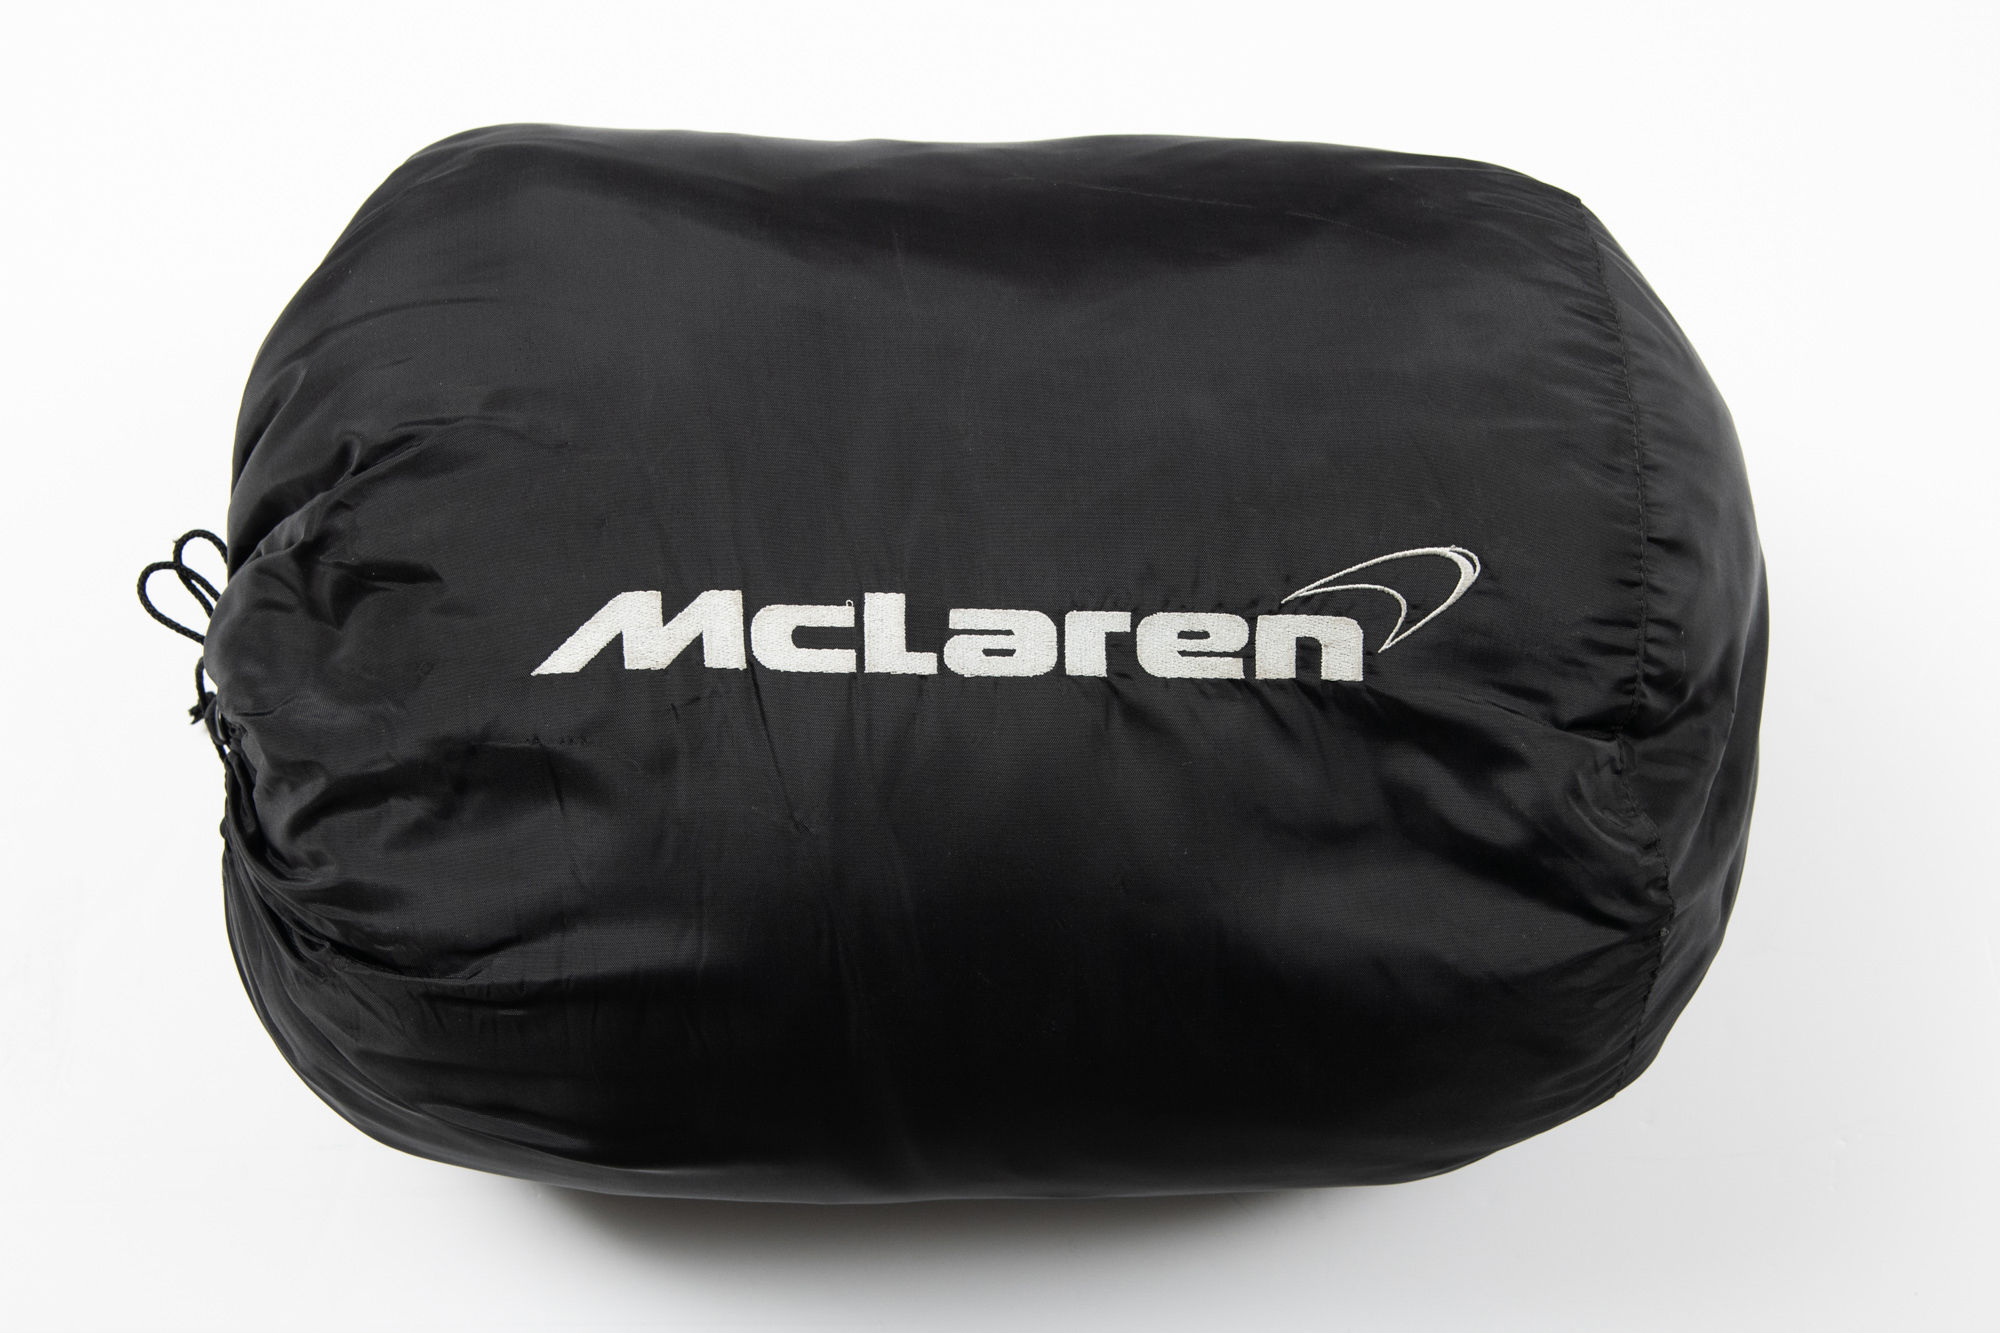 2016 Mclaren P1 GTR, BLACK, VIN SBM12ABB7FW100046, MILEAGE 283